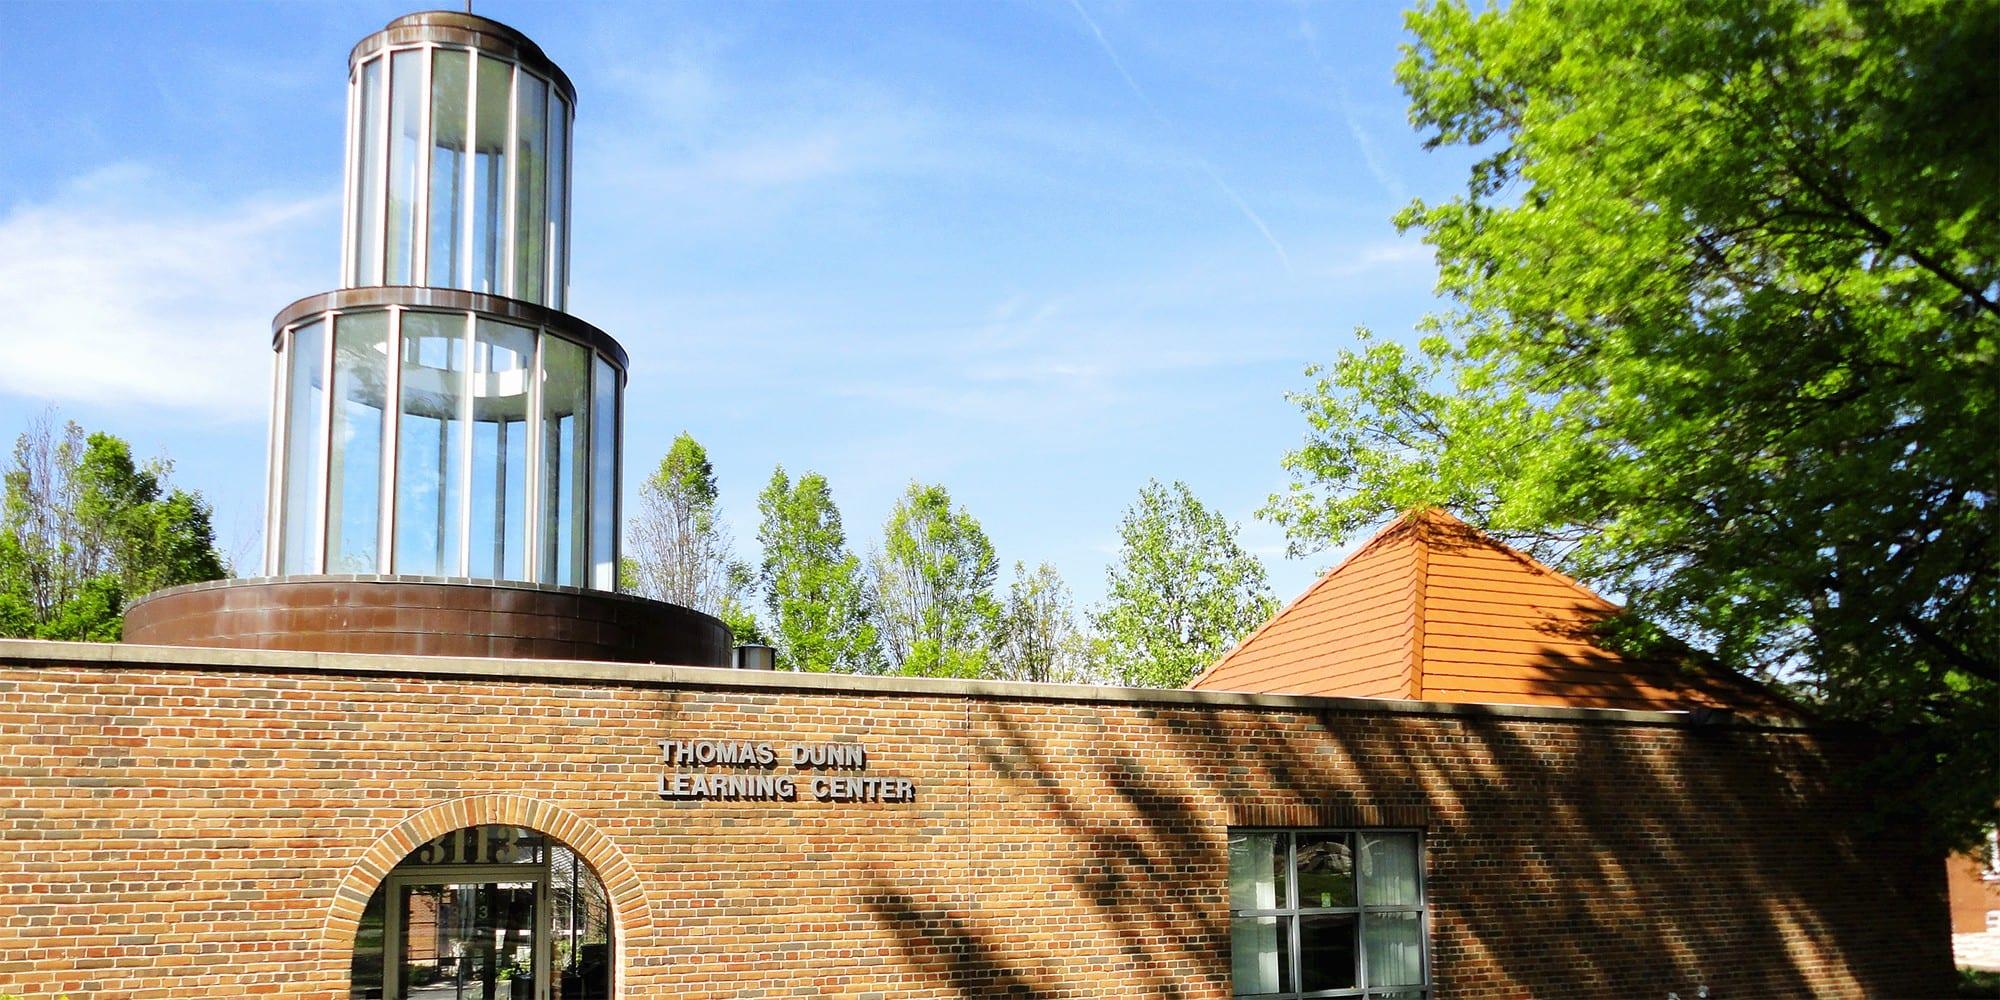 Thomas Dunn Learning Center. Photo by Paul Sableman.